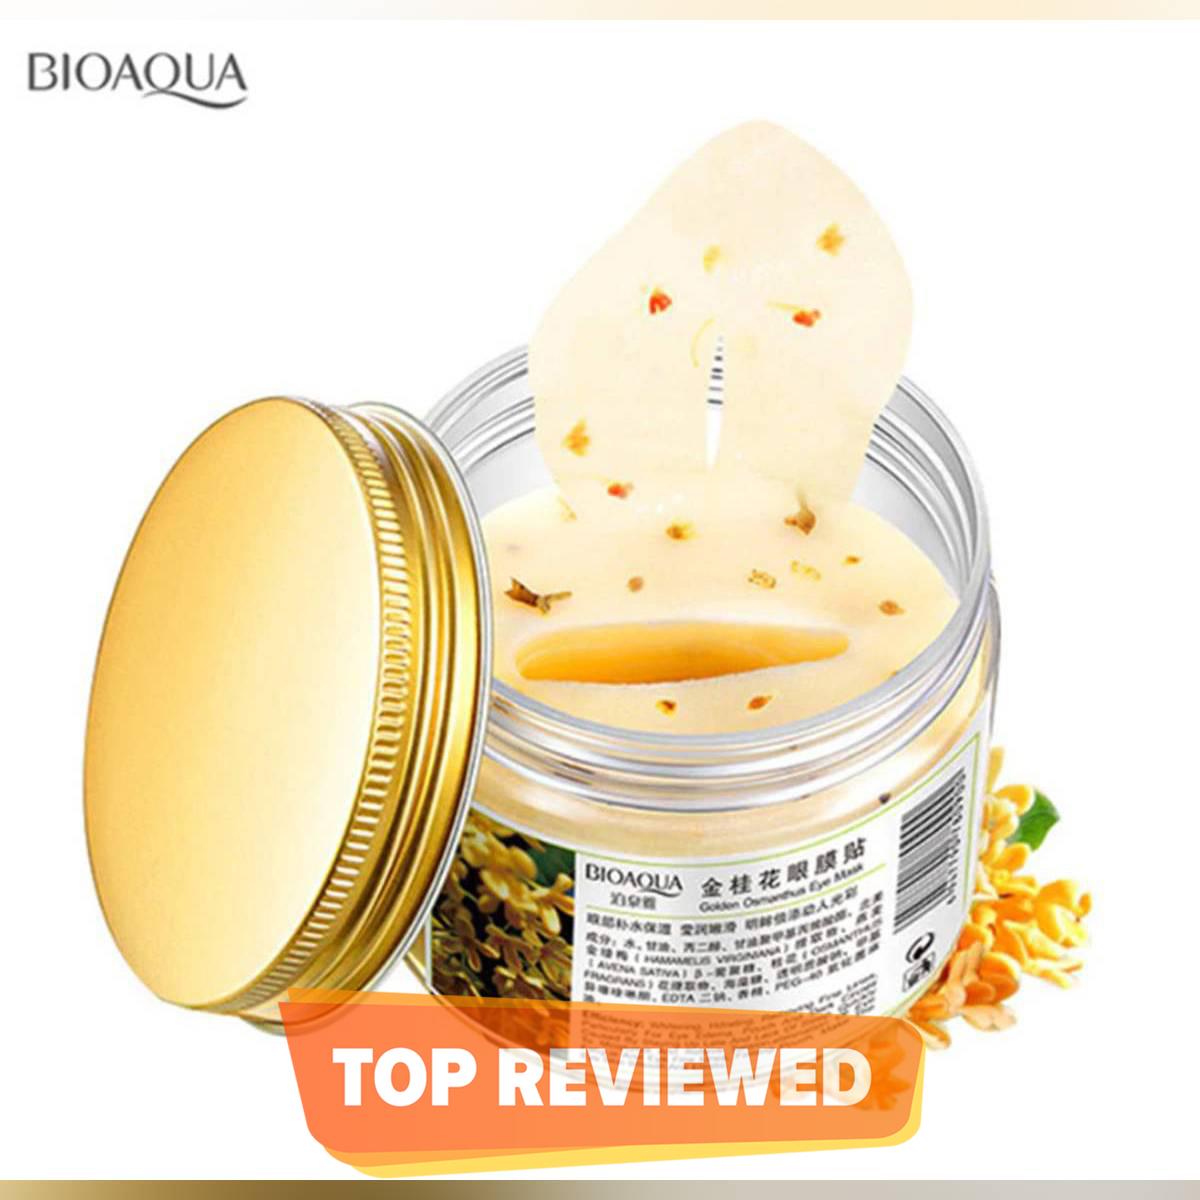 BIOAQUA-Gold Eye Mask Patch for Women Dark Circle Gel (80 PATCH)-BQY0900